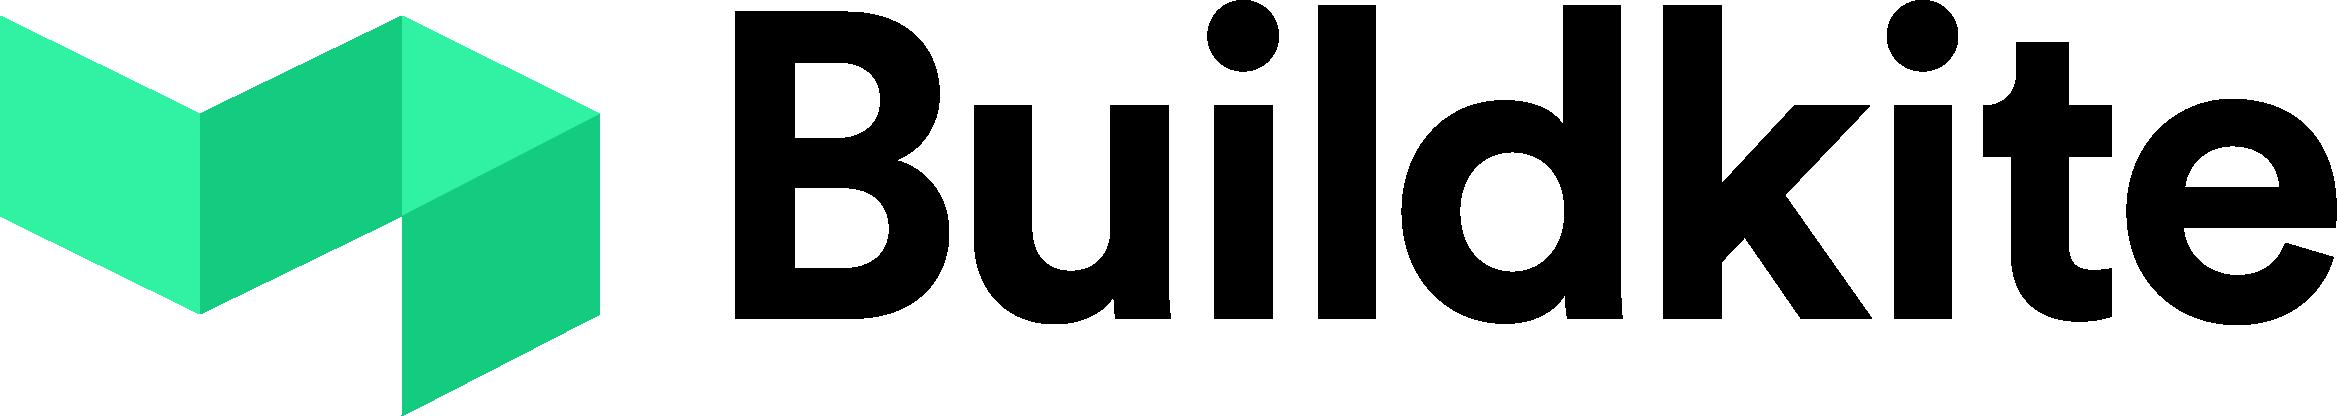 Buildkite logo